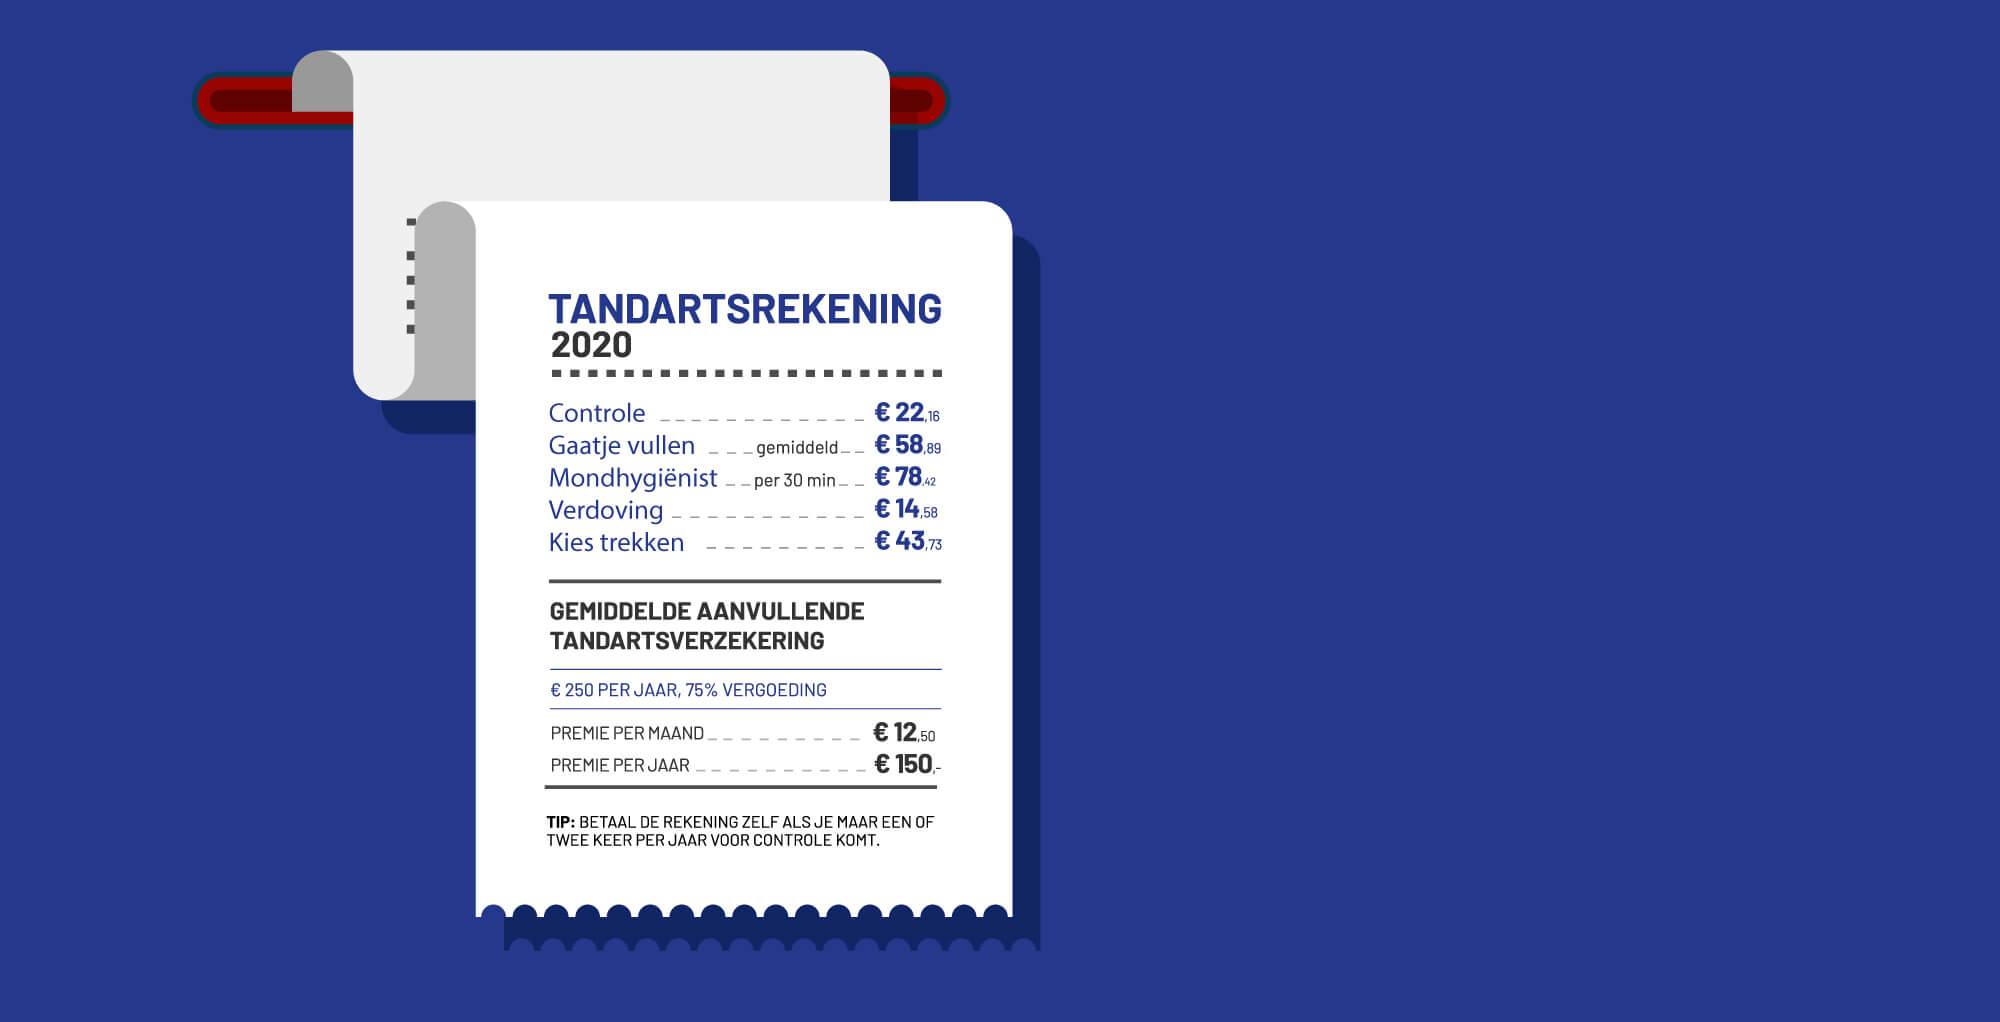 Tandartsrekening-2020